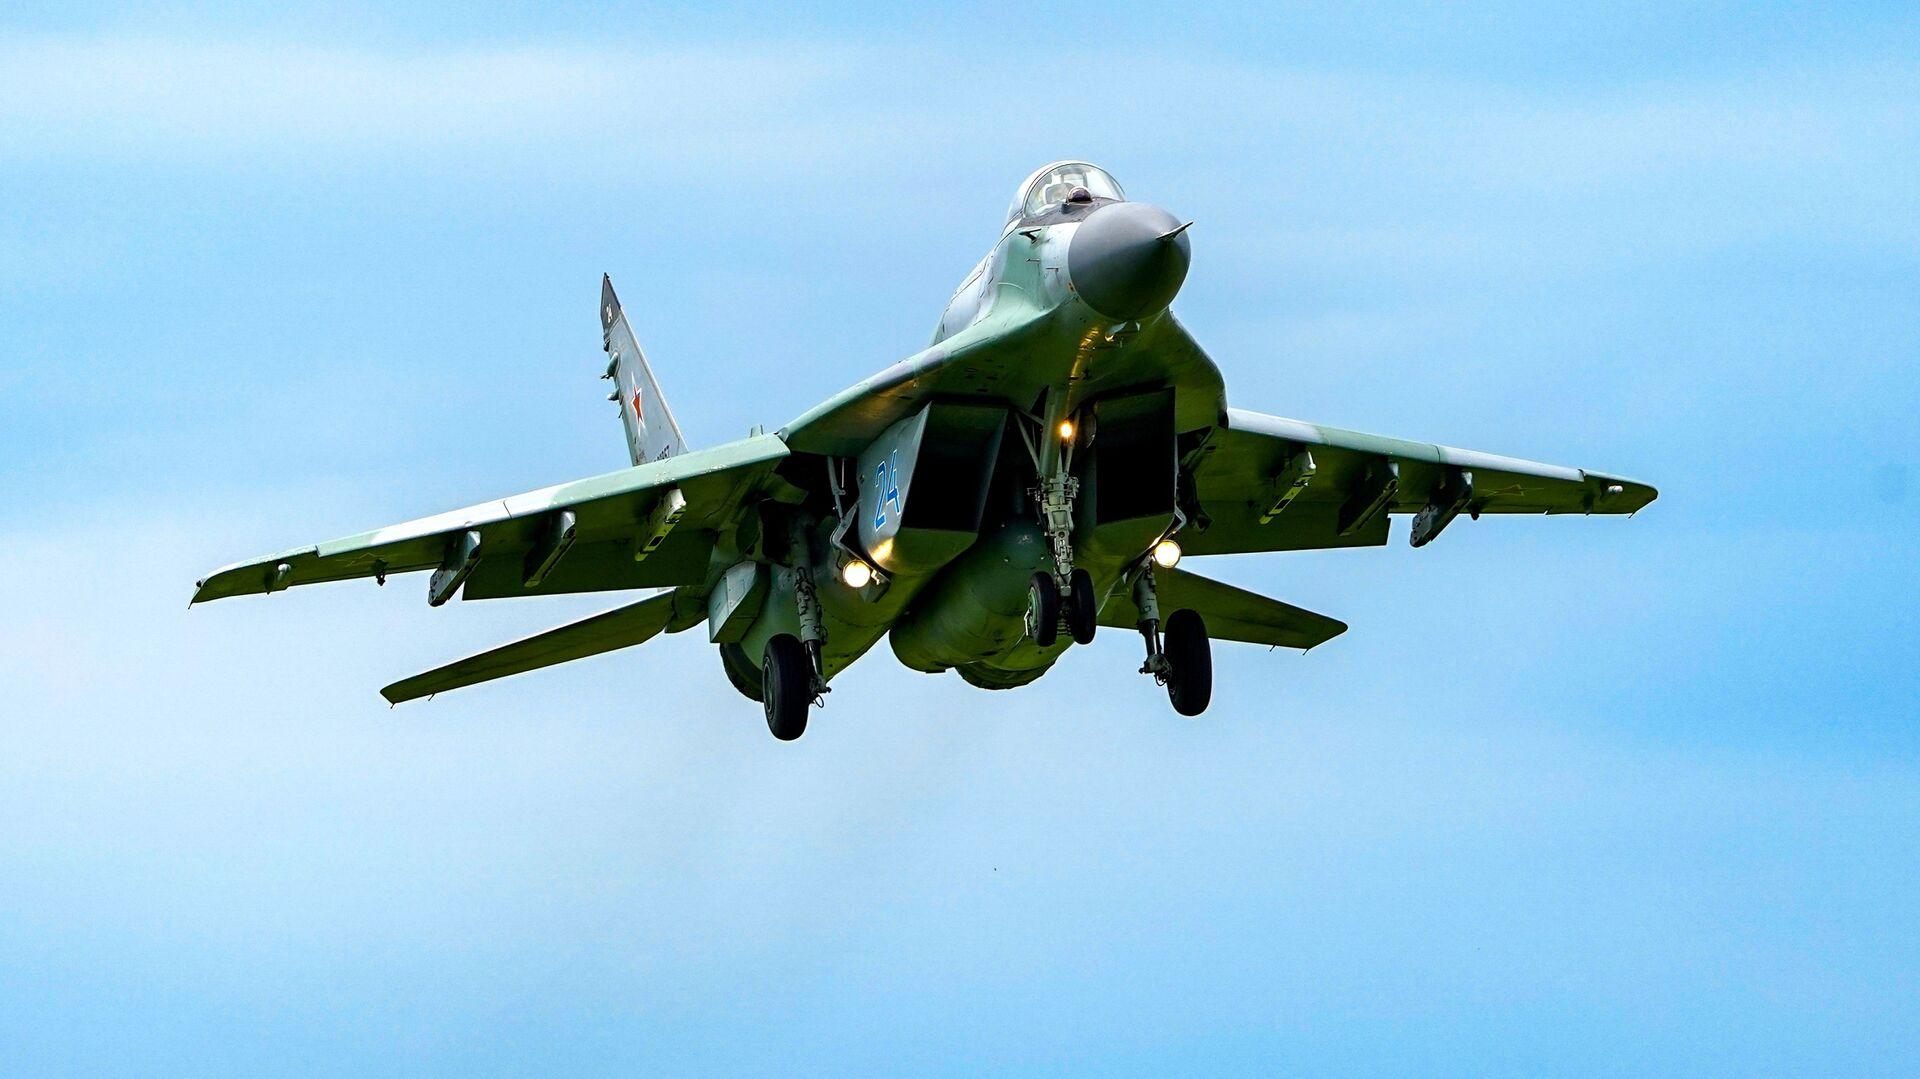 Il caccia MiG-29 - Sputnik Italia, 1920, 18.08.2021